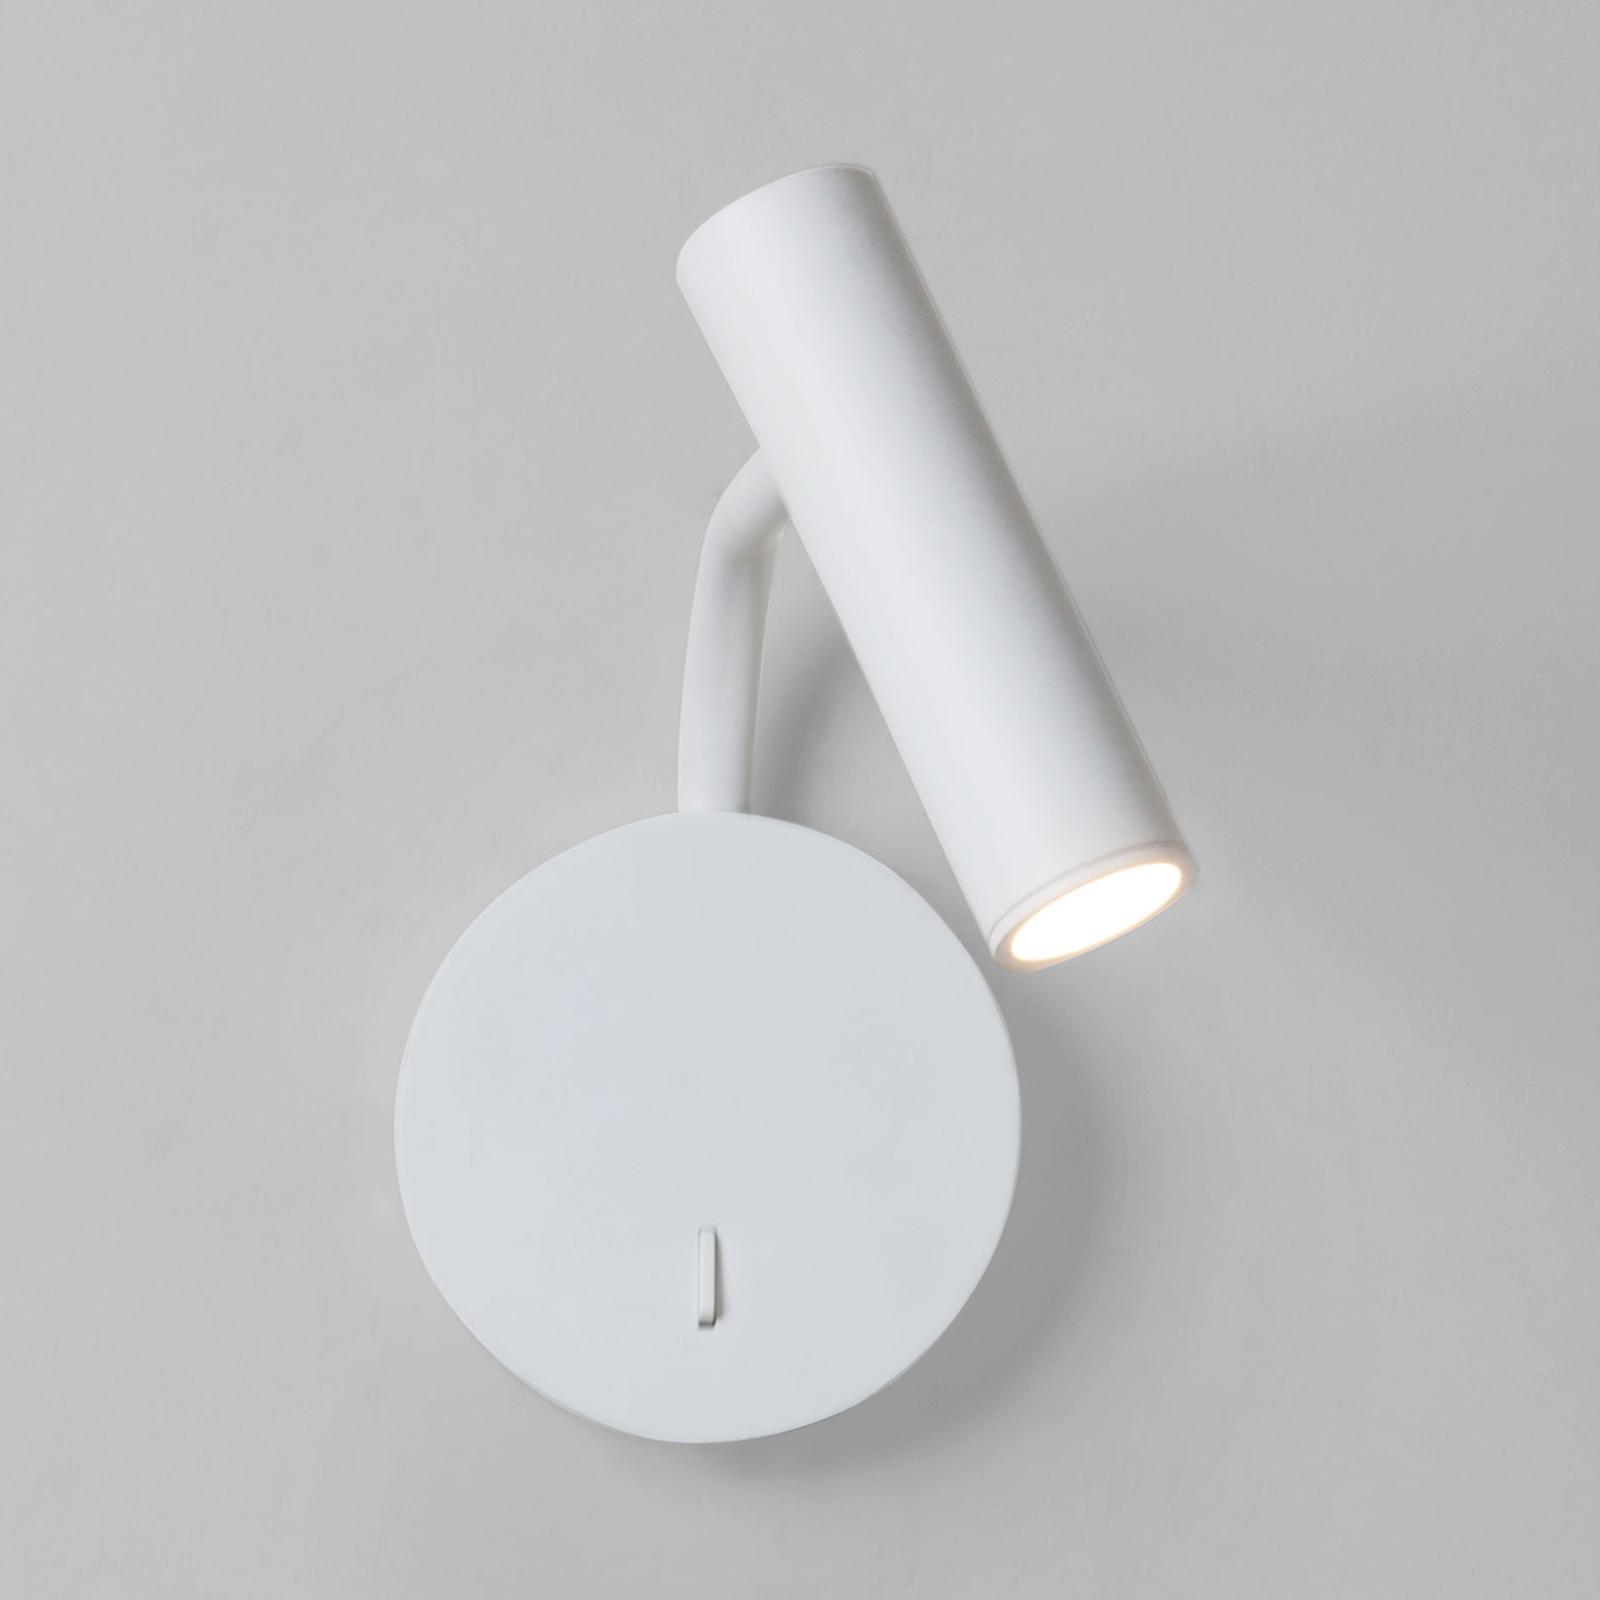 Astro Enna Wall LED-Wandleuchte schwenkbar weiß